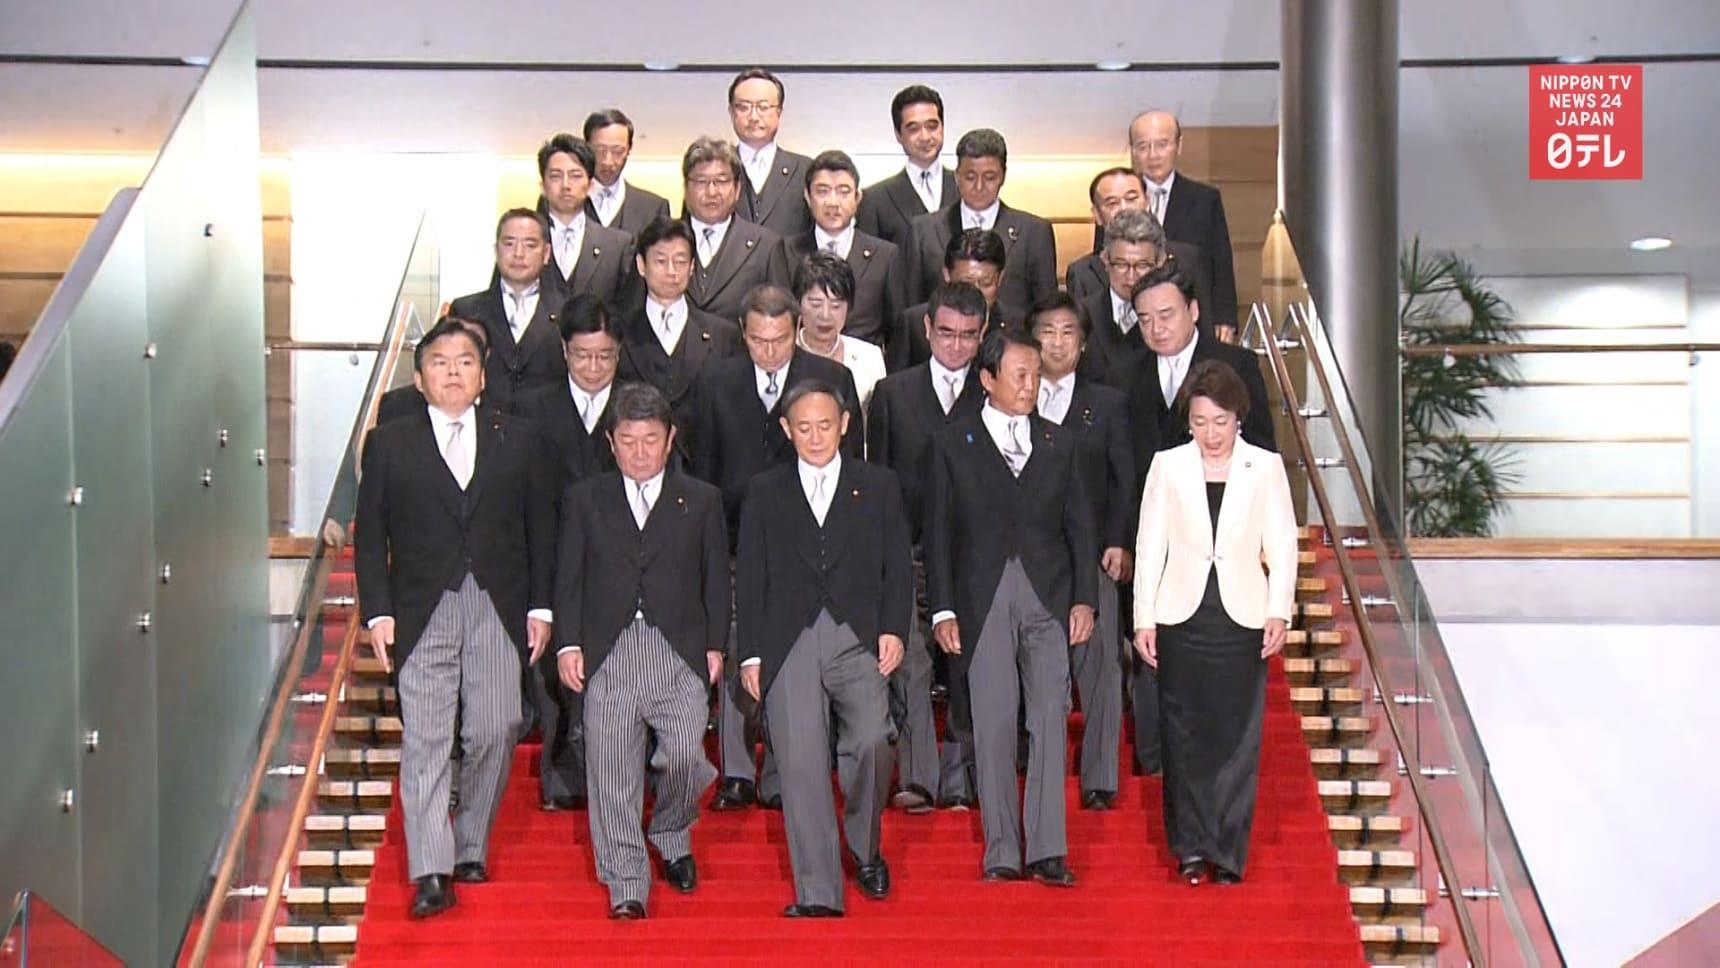 Prime Minister Suga's Plans for Japan